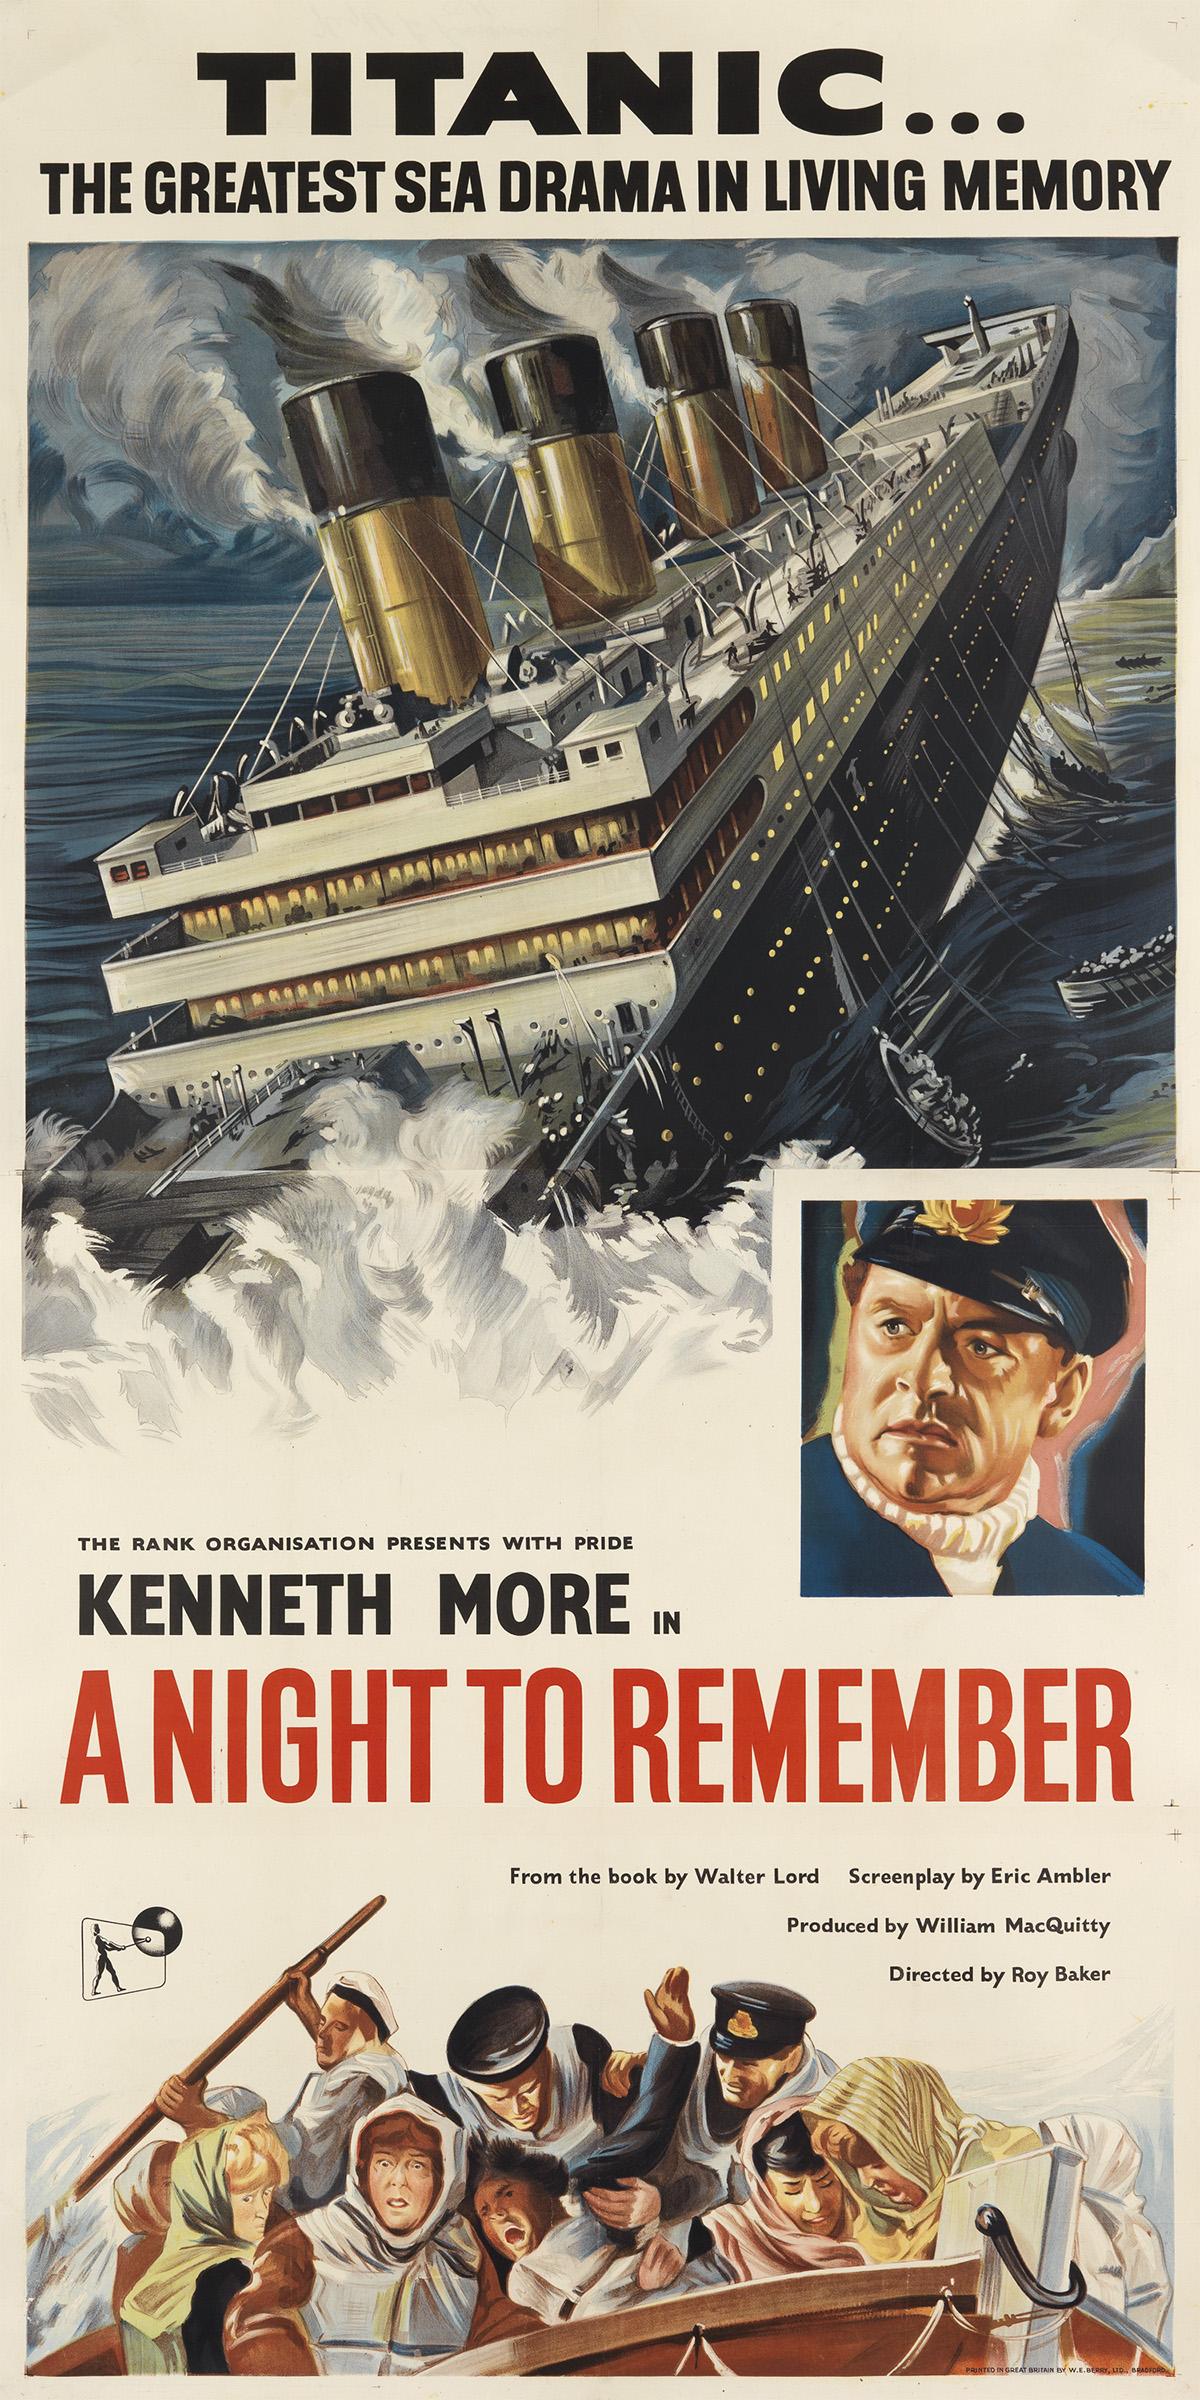 DESIGNER-UNKNOWN-TITANIC-----A-NIGHT-TO-REMEMBER-1958-80x40-